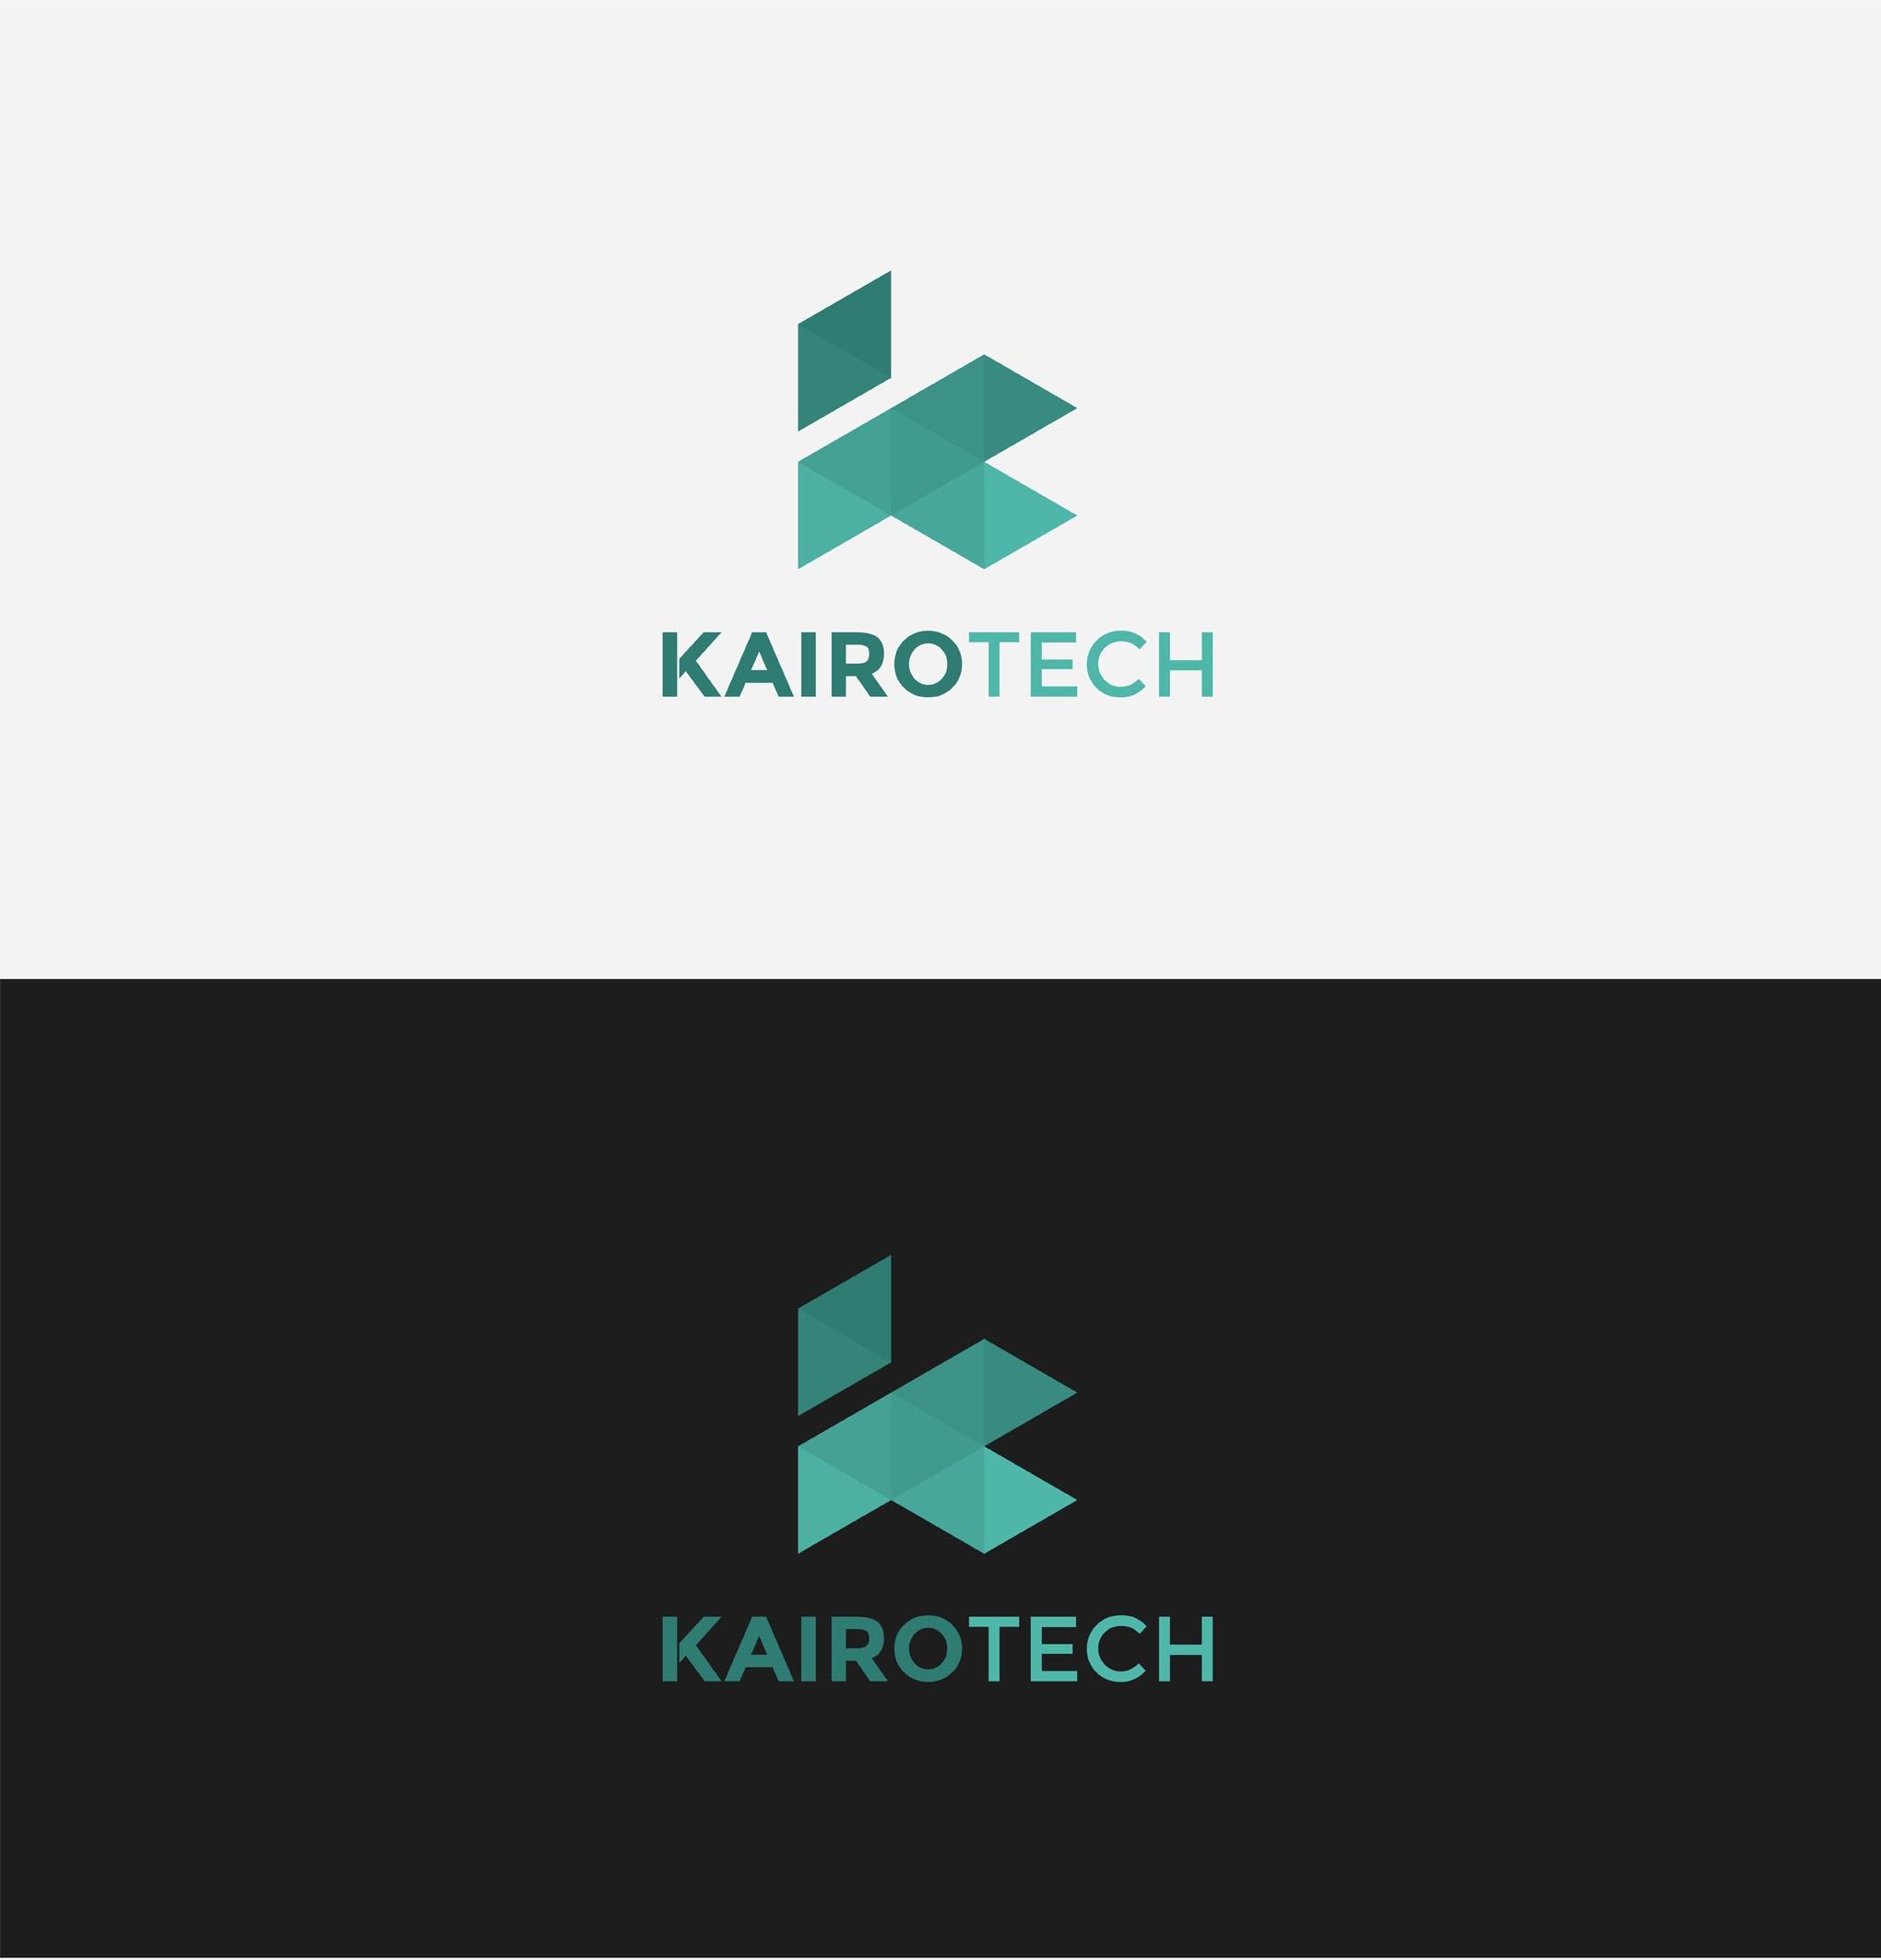 Kairo Tech logo. Simple, modern lettering logo